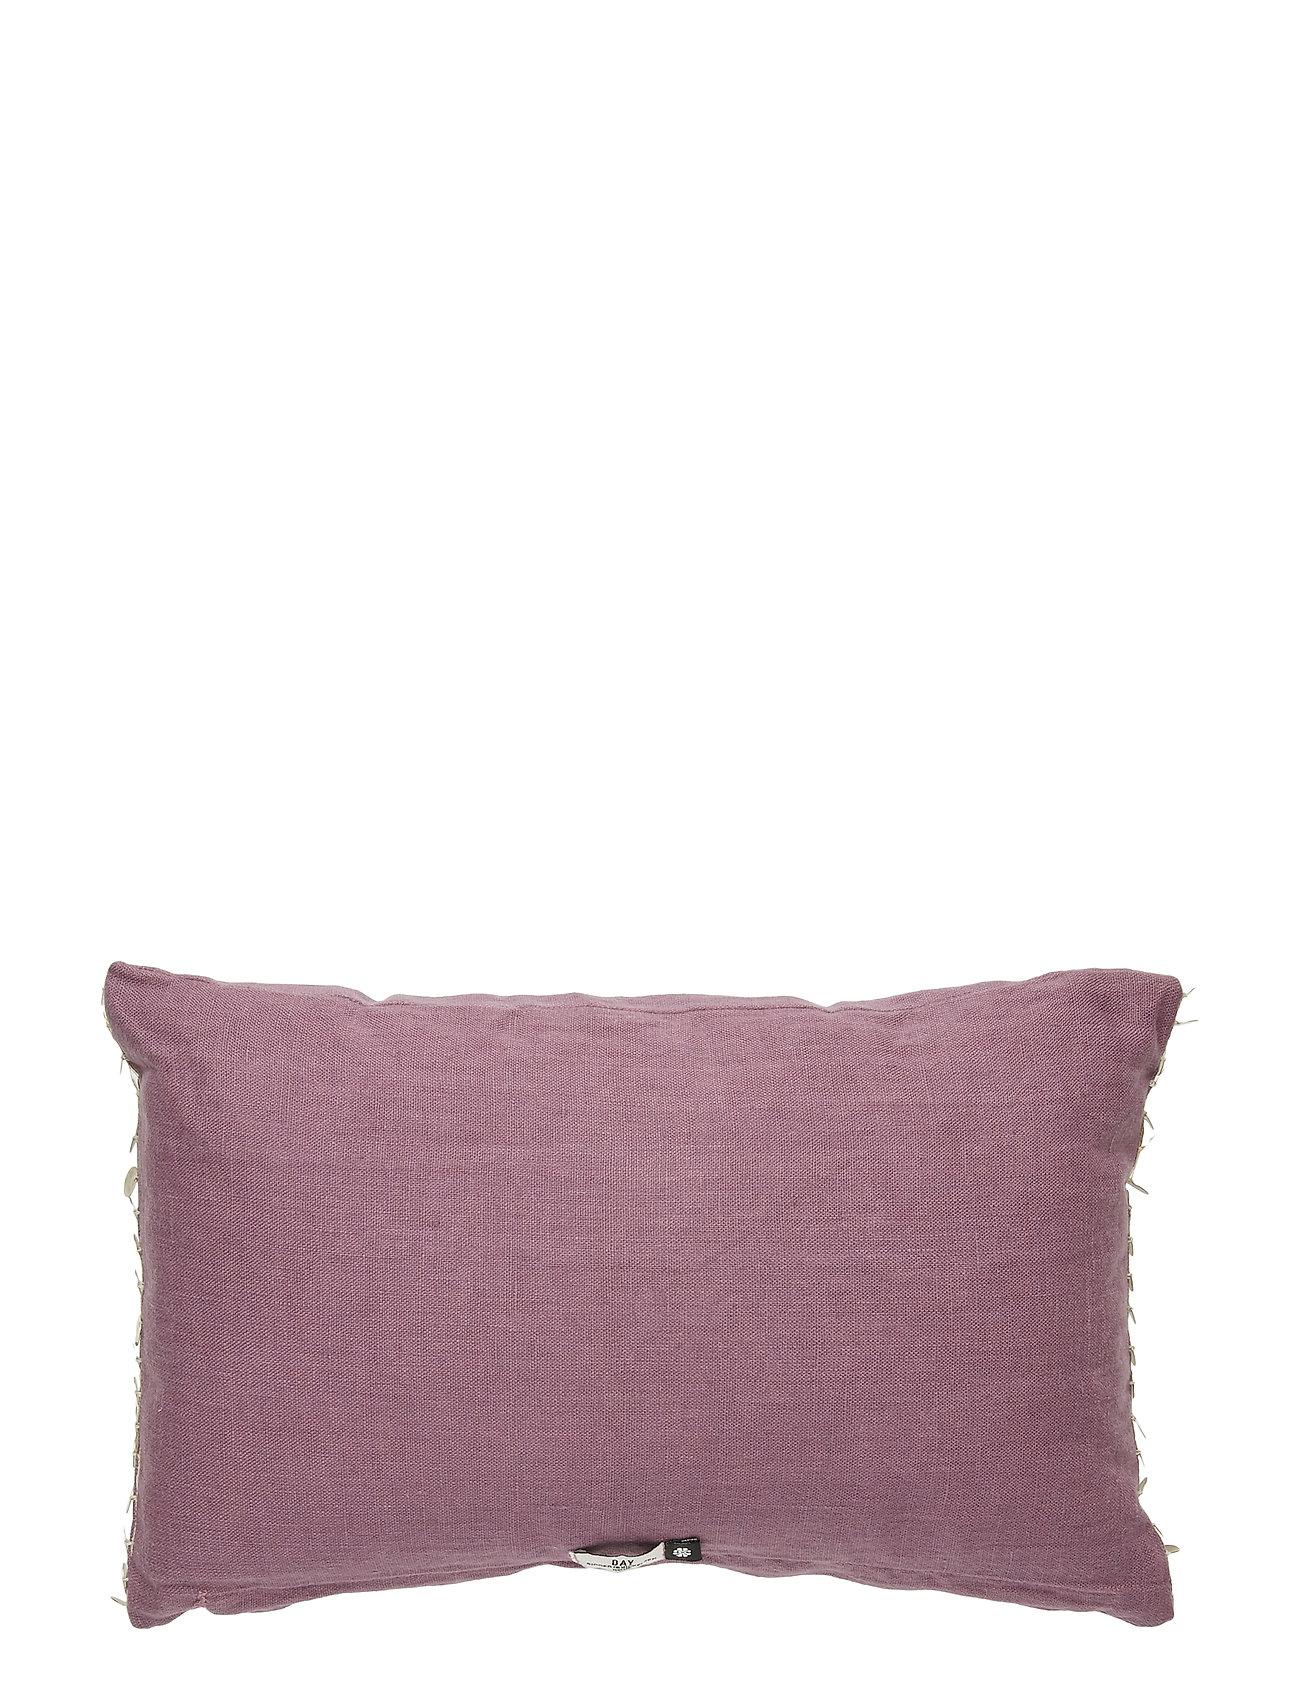 Day Cushion Maroc CoverlilacHome Baby Day 8wOP0nkX